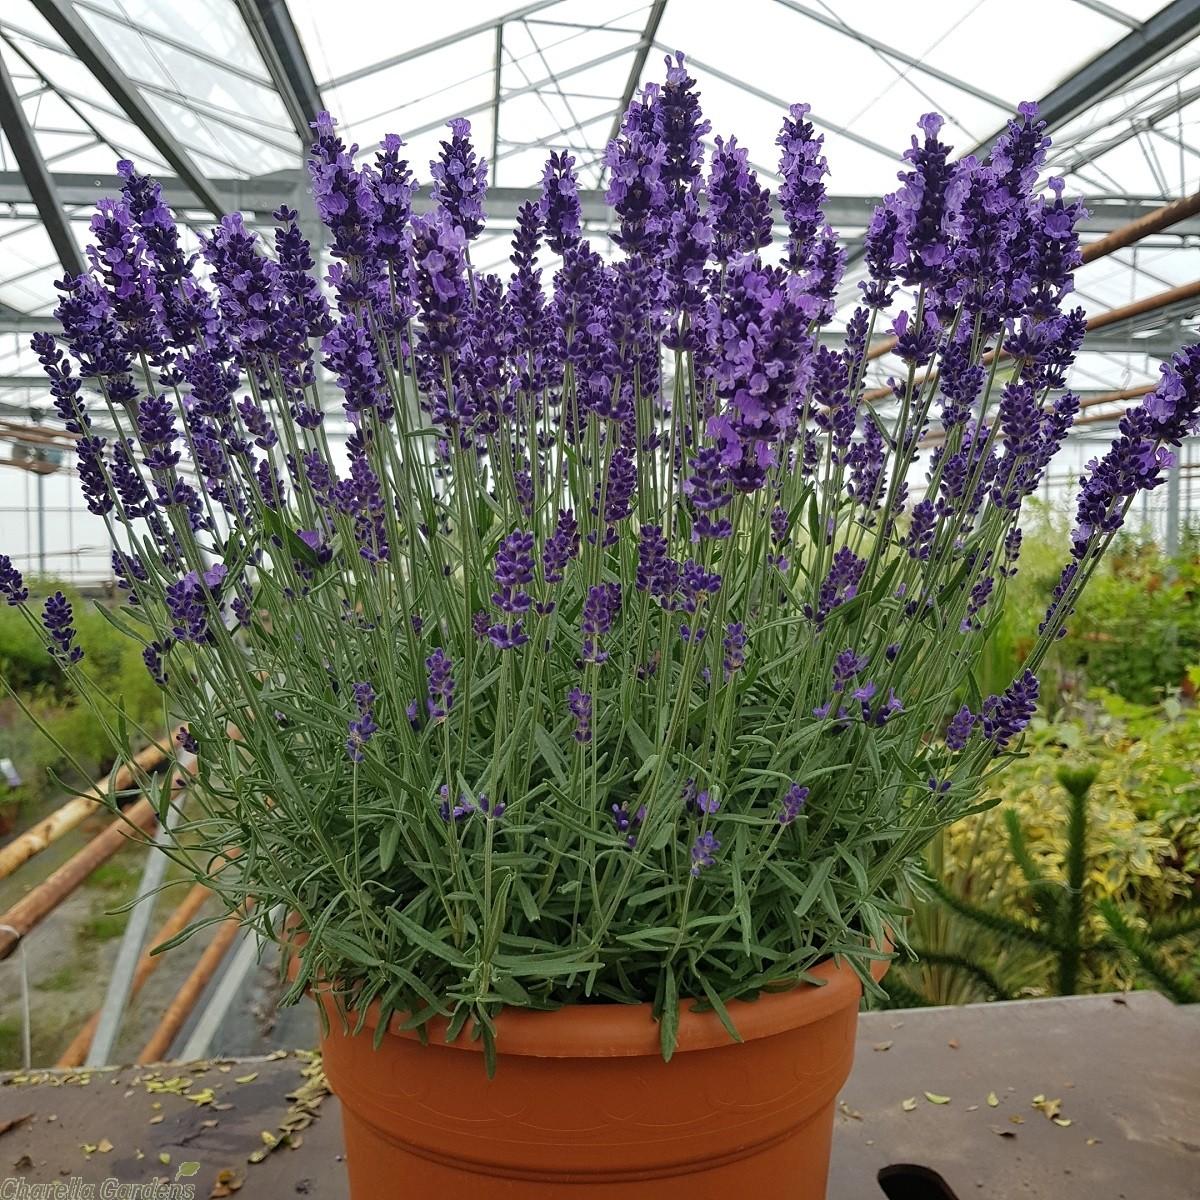 large_lavender_plants._lavender_angustifolia_hidcote_3__1.jpg